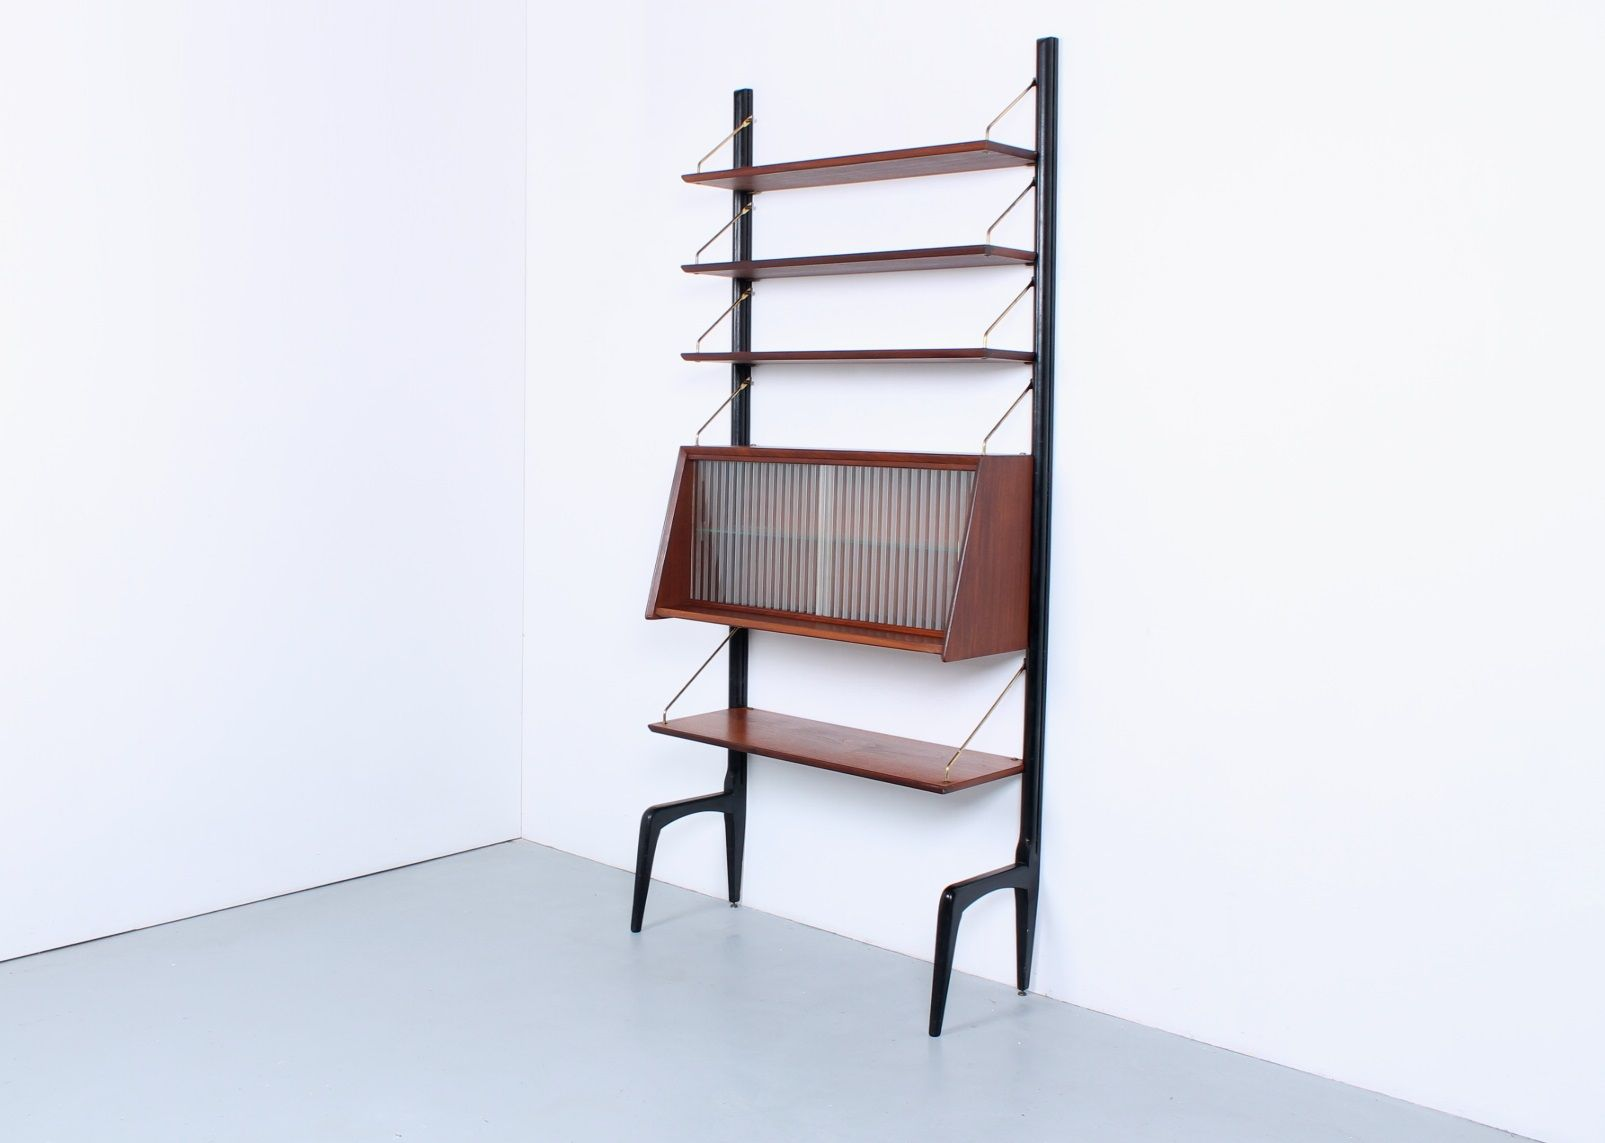 Libreria modulare in teak con ante in vetro di Louis van Teeffelen ...